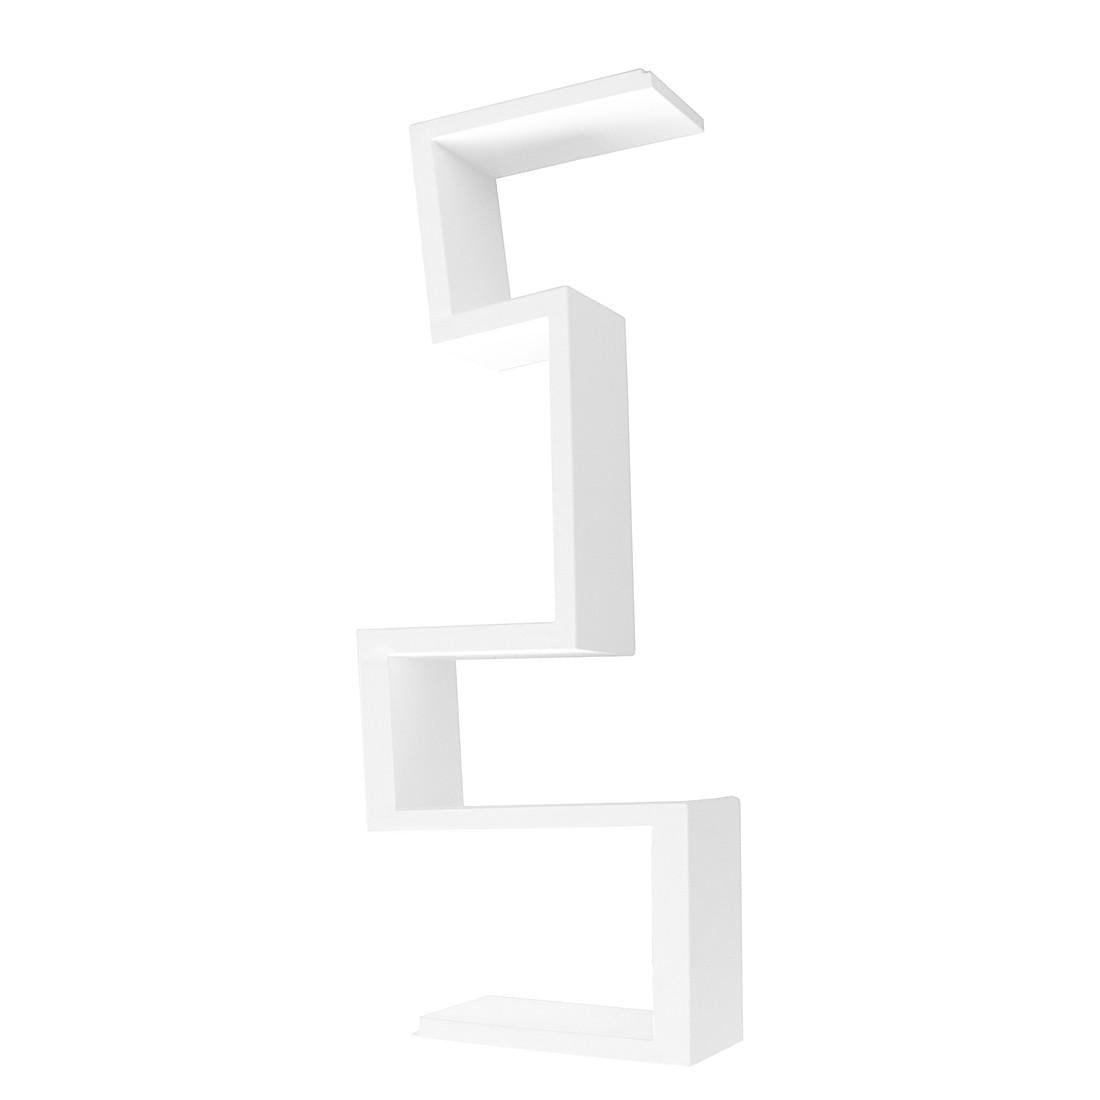 Bücherregal Shiro – Eisen – Weiß, Metrocuadro Design bestellen